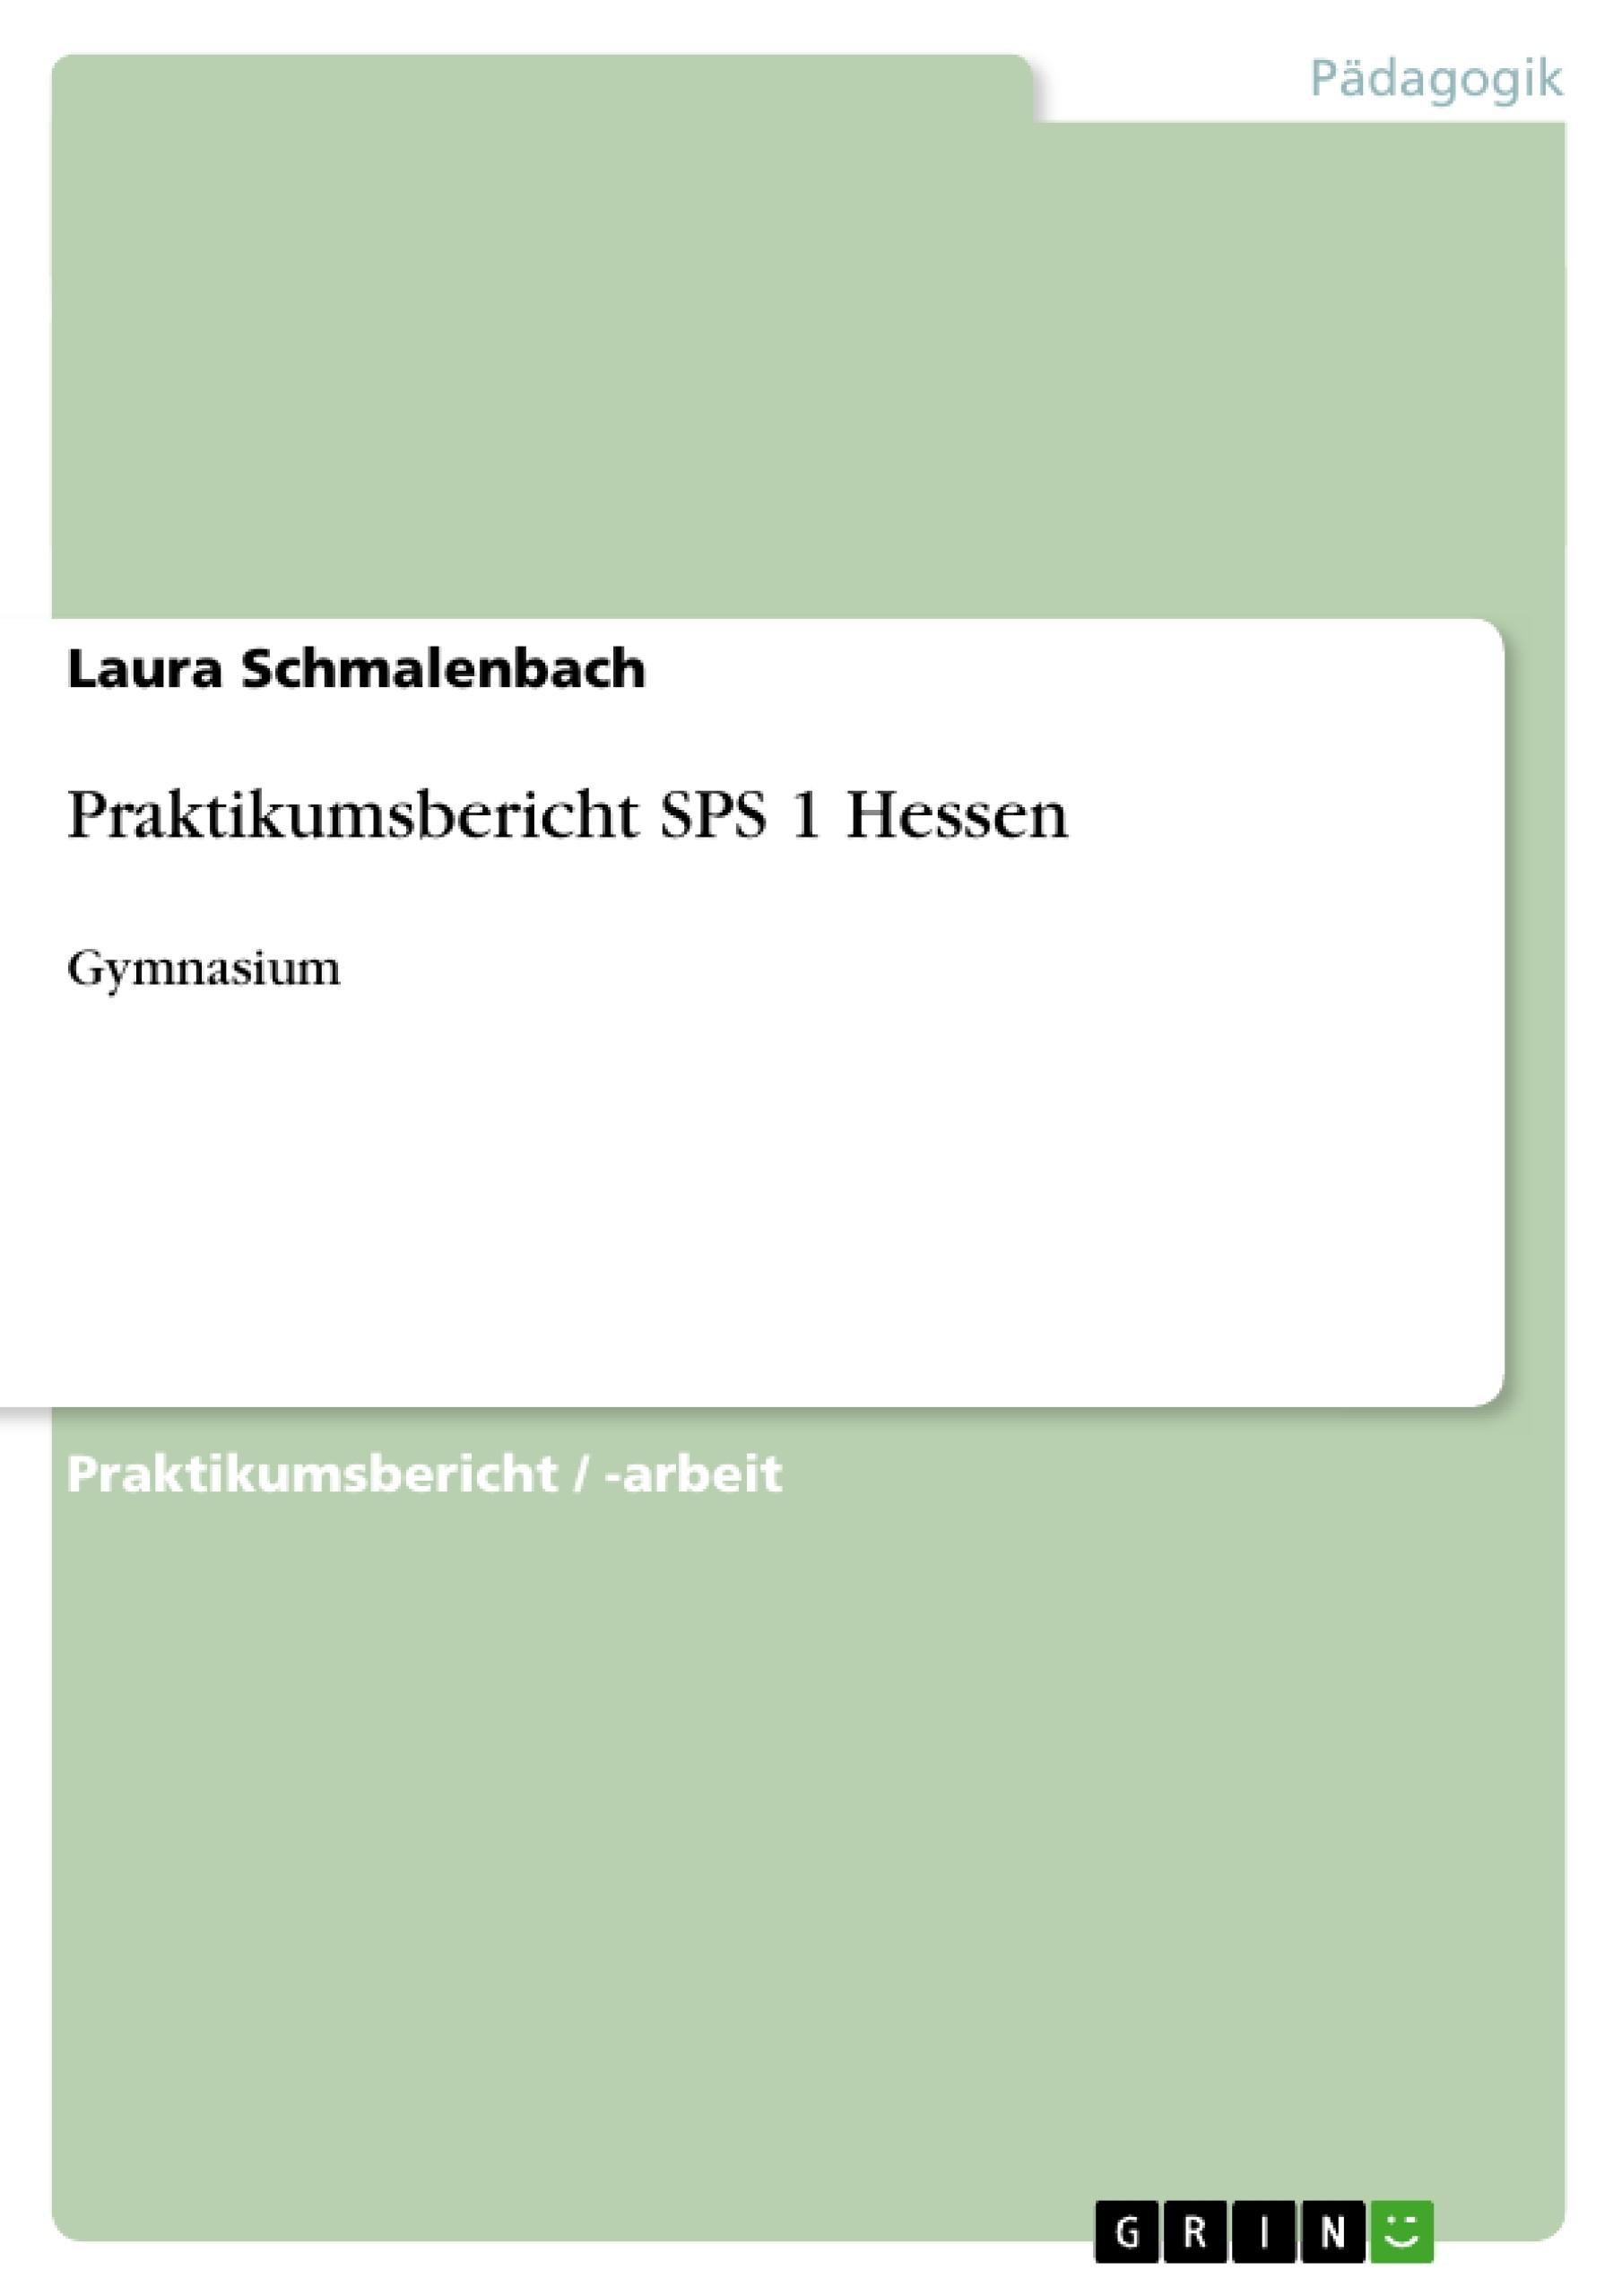 Titel: Praktikumsbericht SPS 1 Hessen